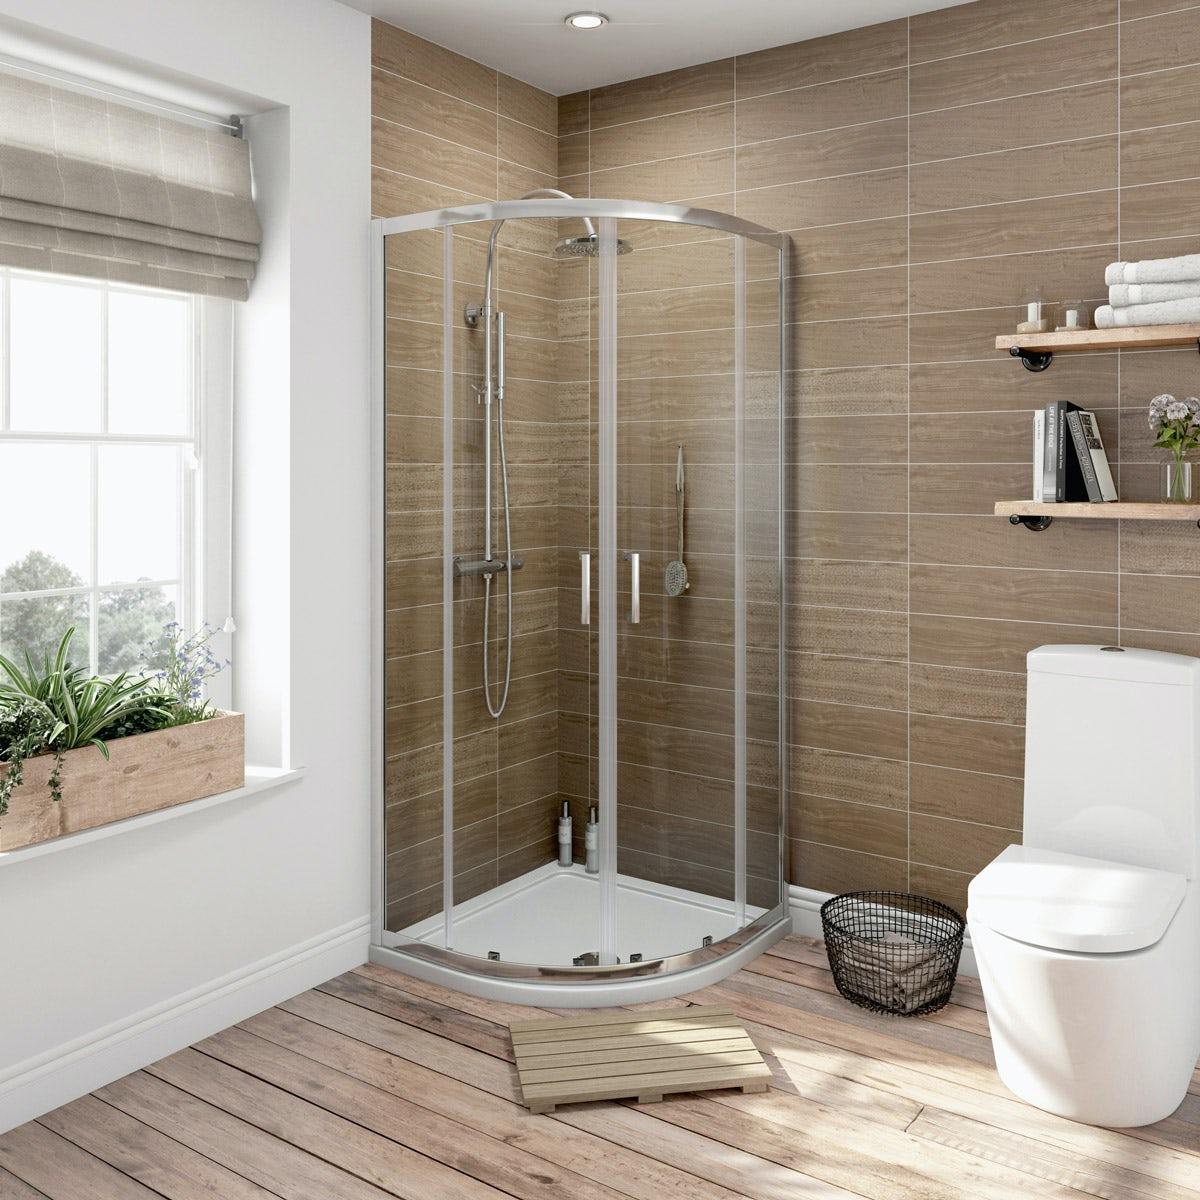 6mm sliding door quadrant shower enclosure 800 x 800